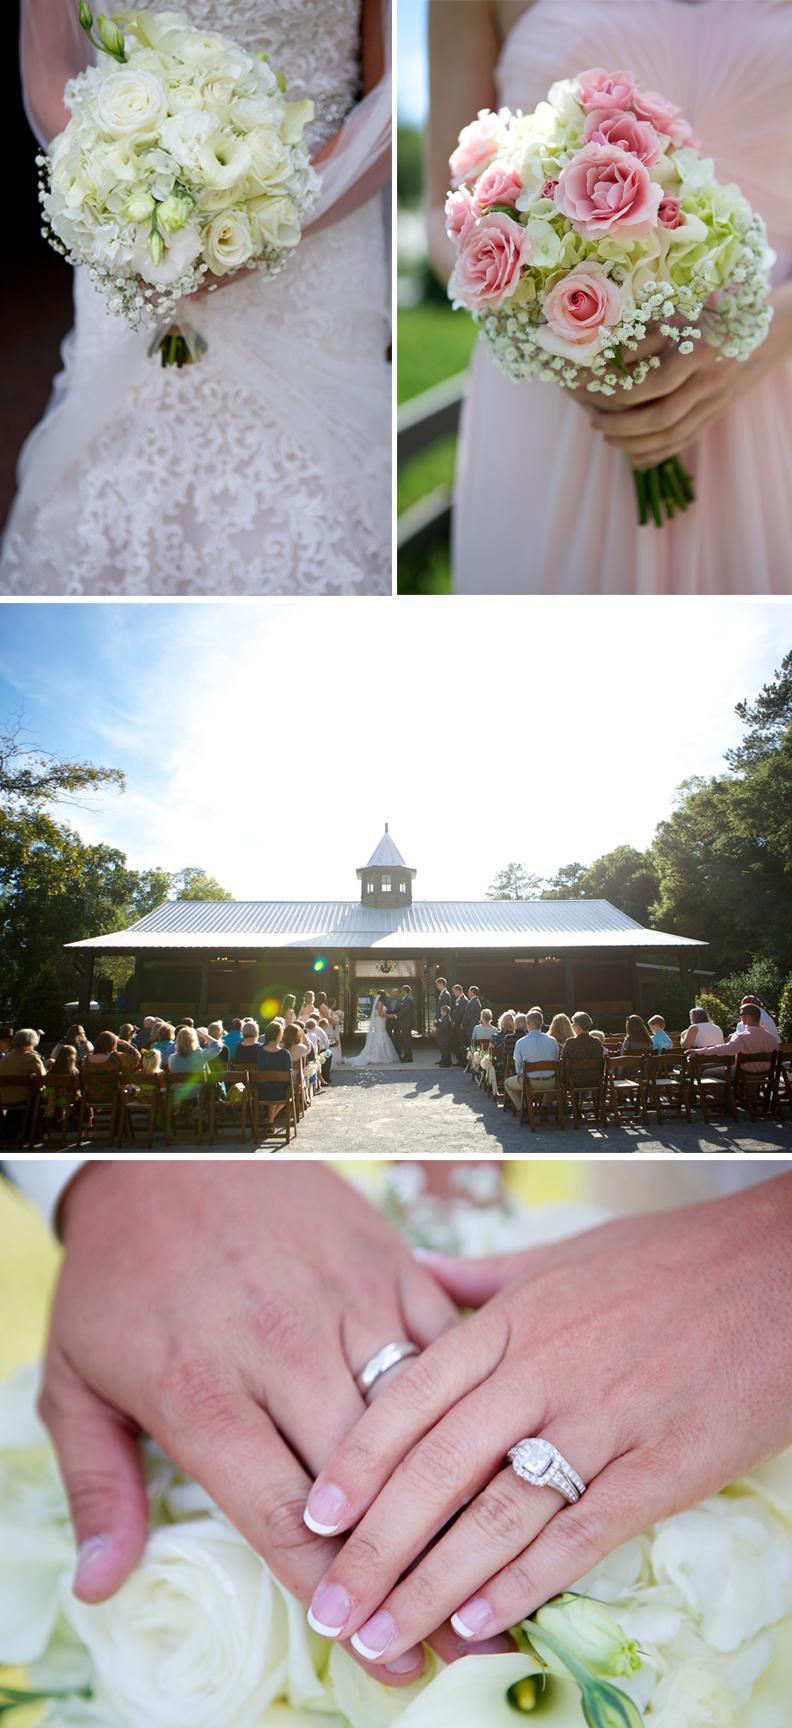 King_Wedding_Arden_Photography3.jpg